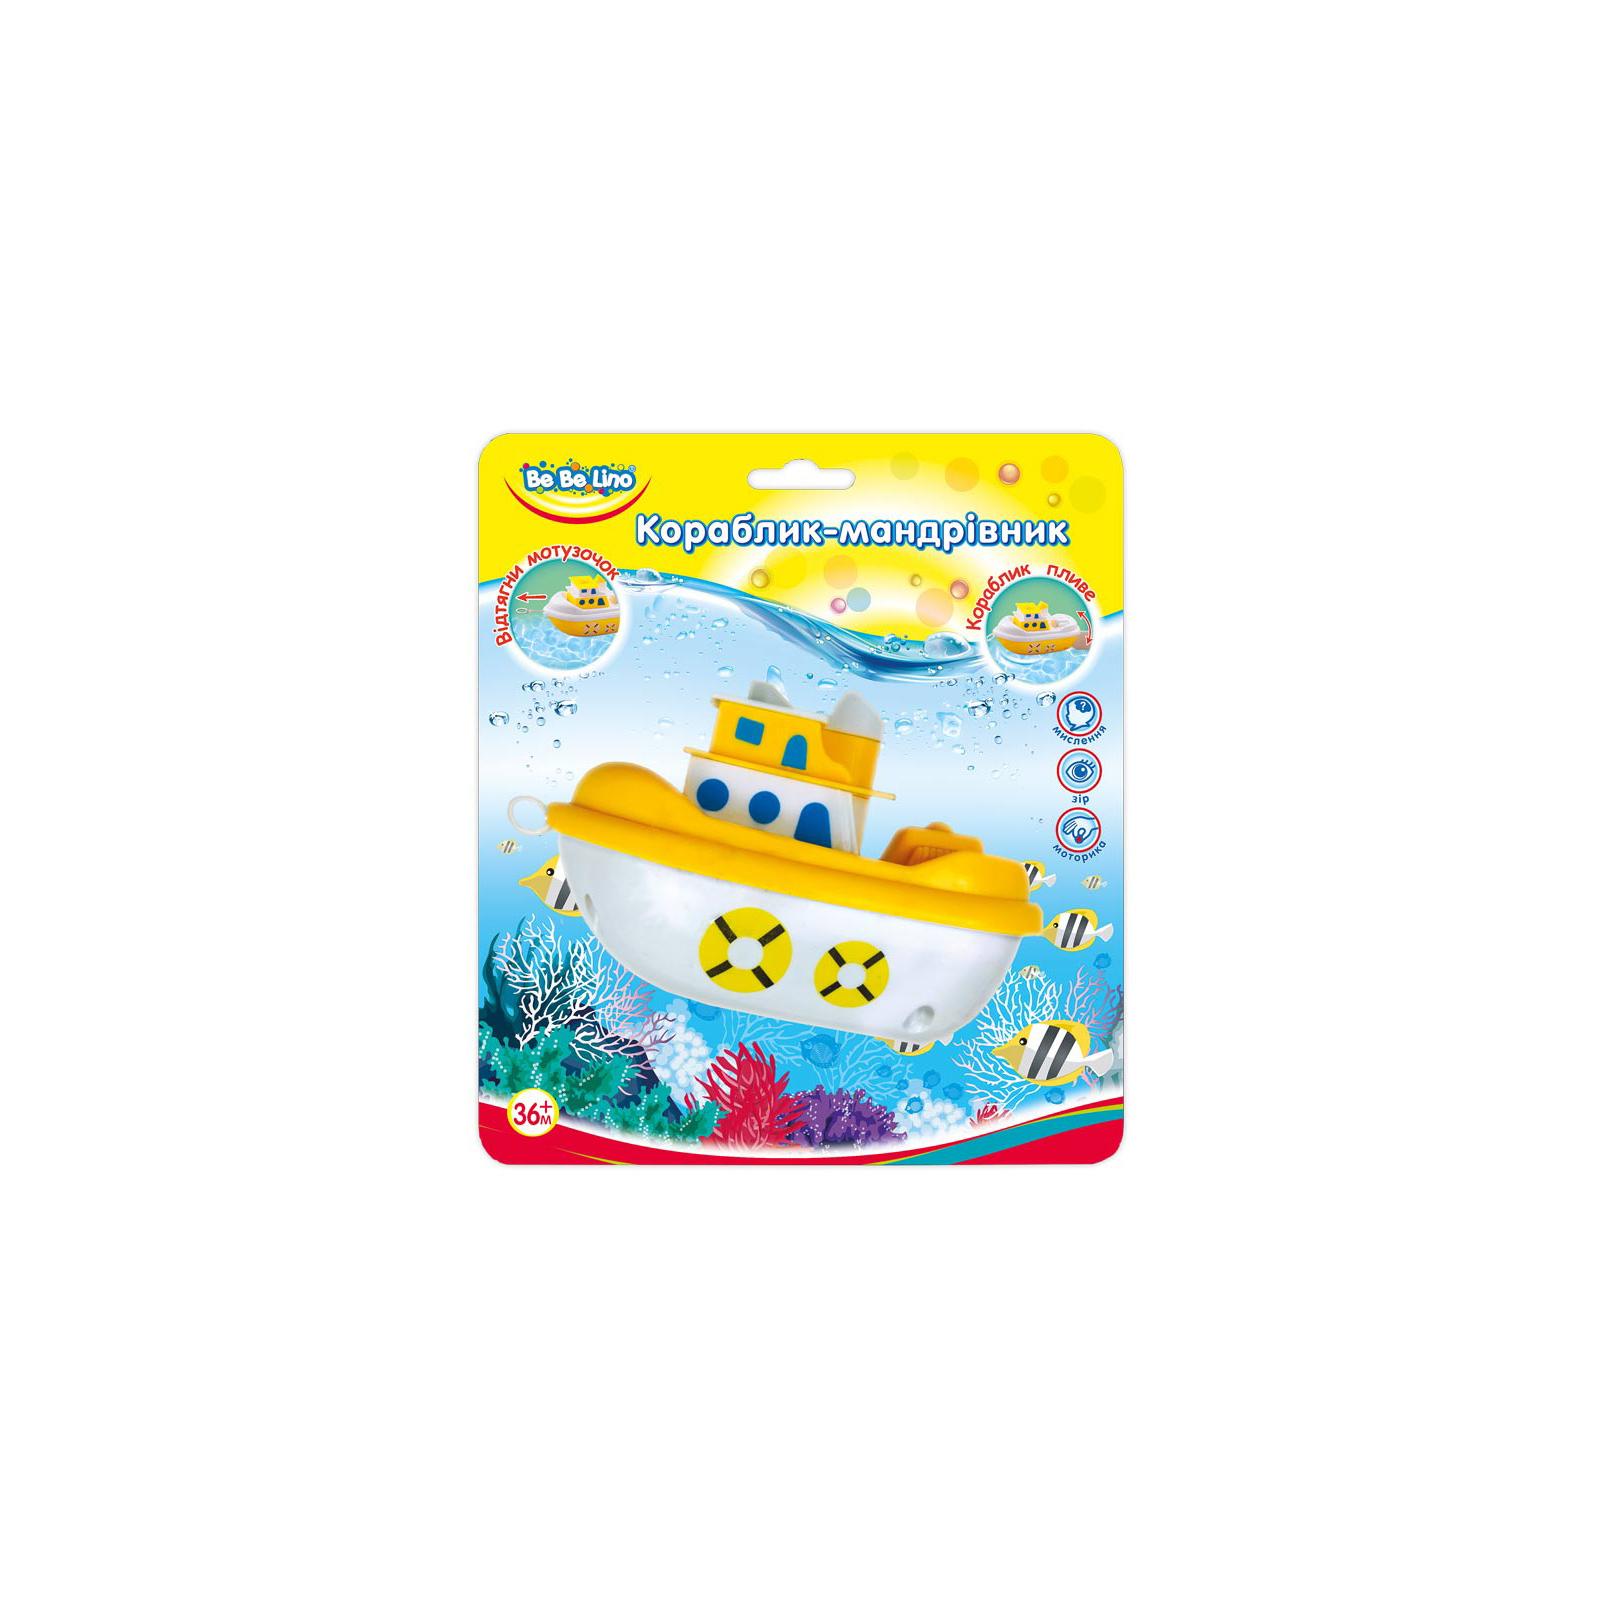 Развивающая игрушка BeBeLino Кораблик путешественник (57080)